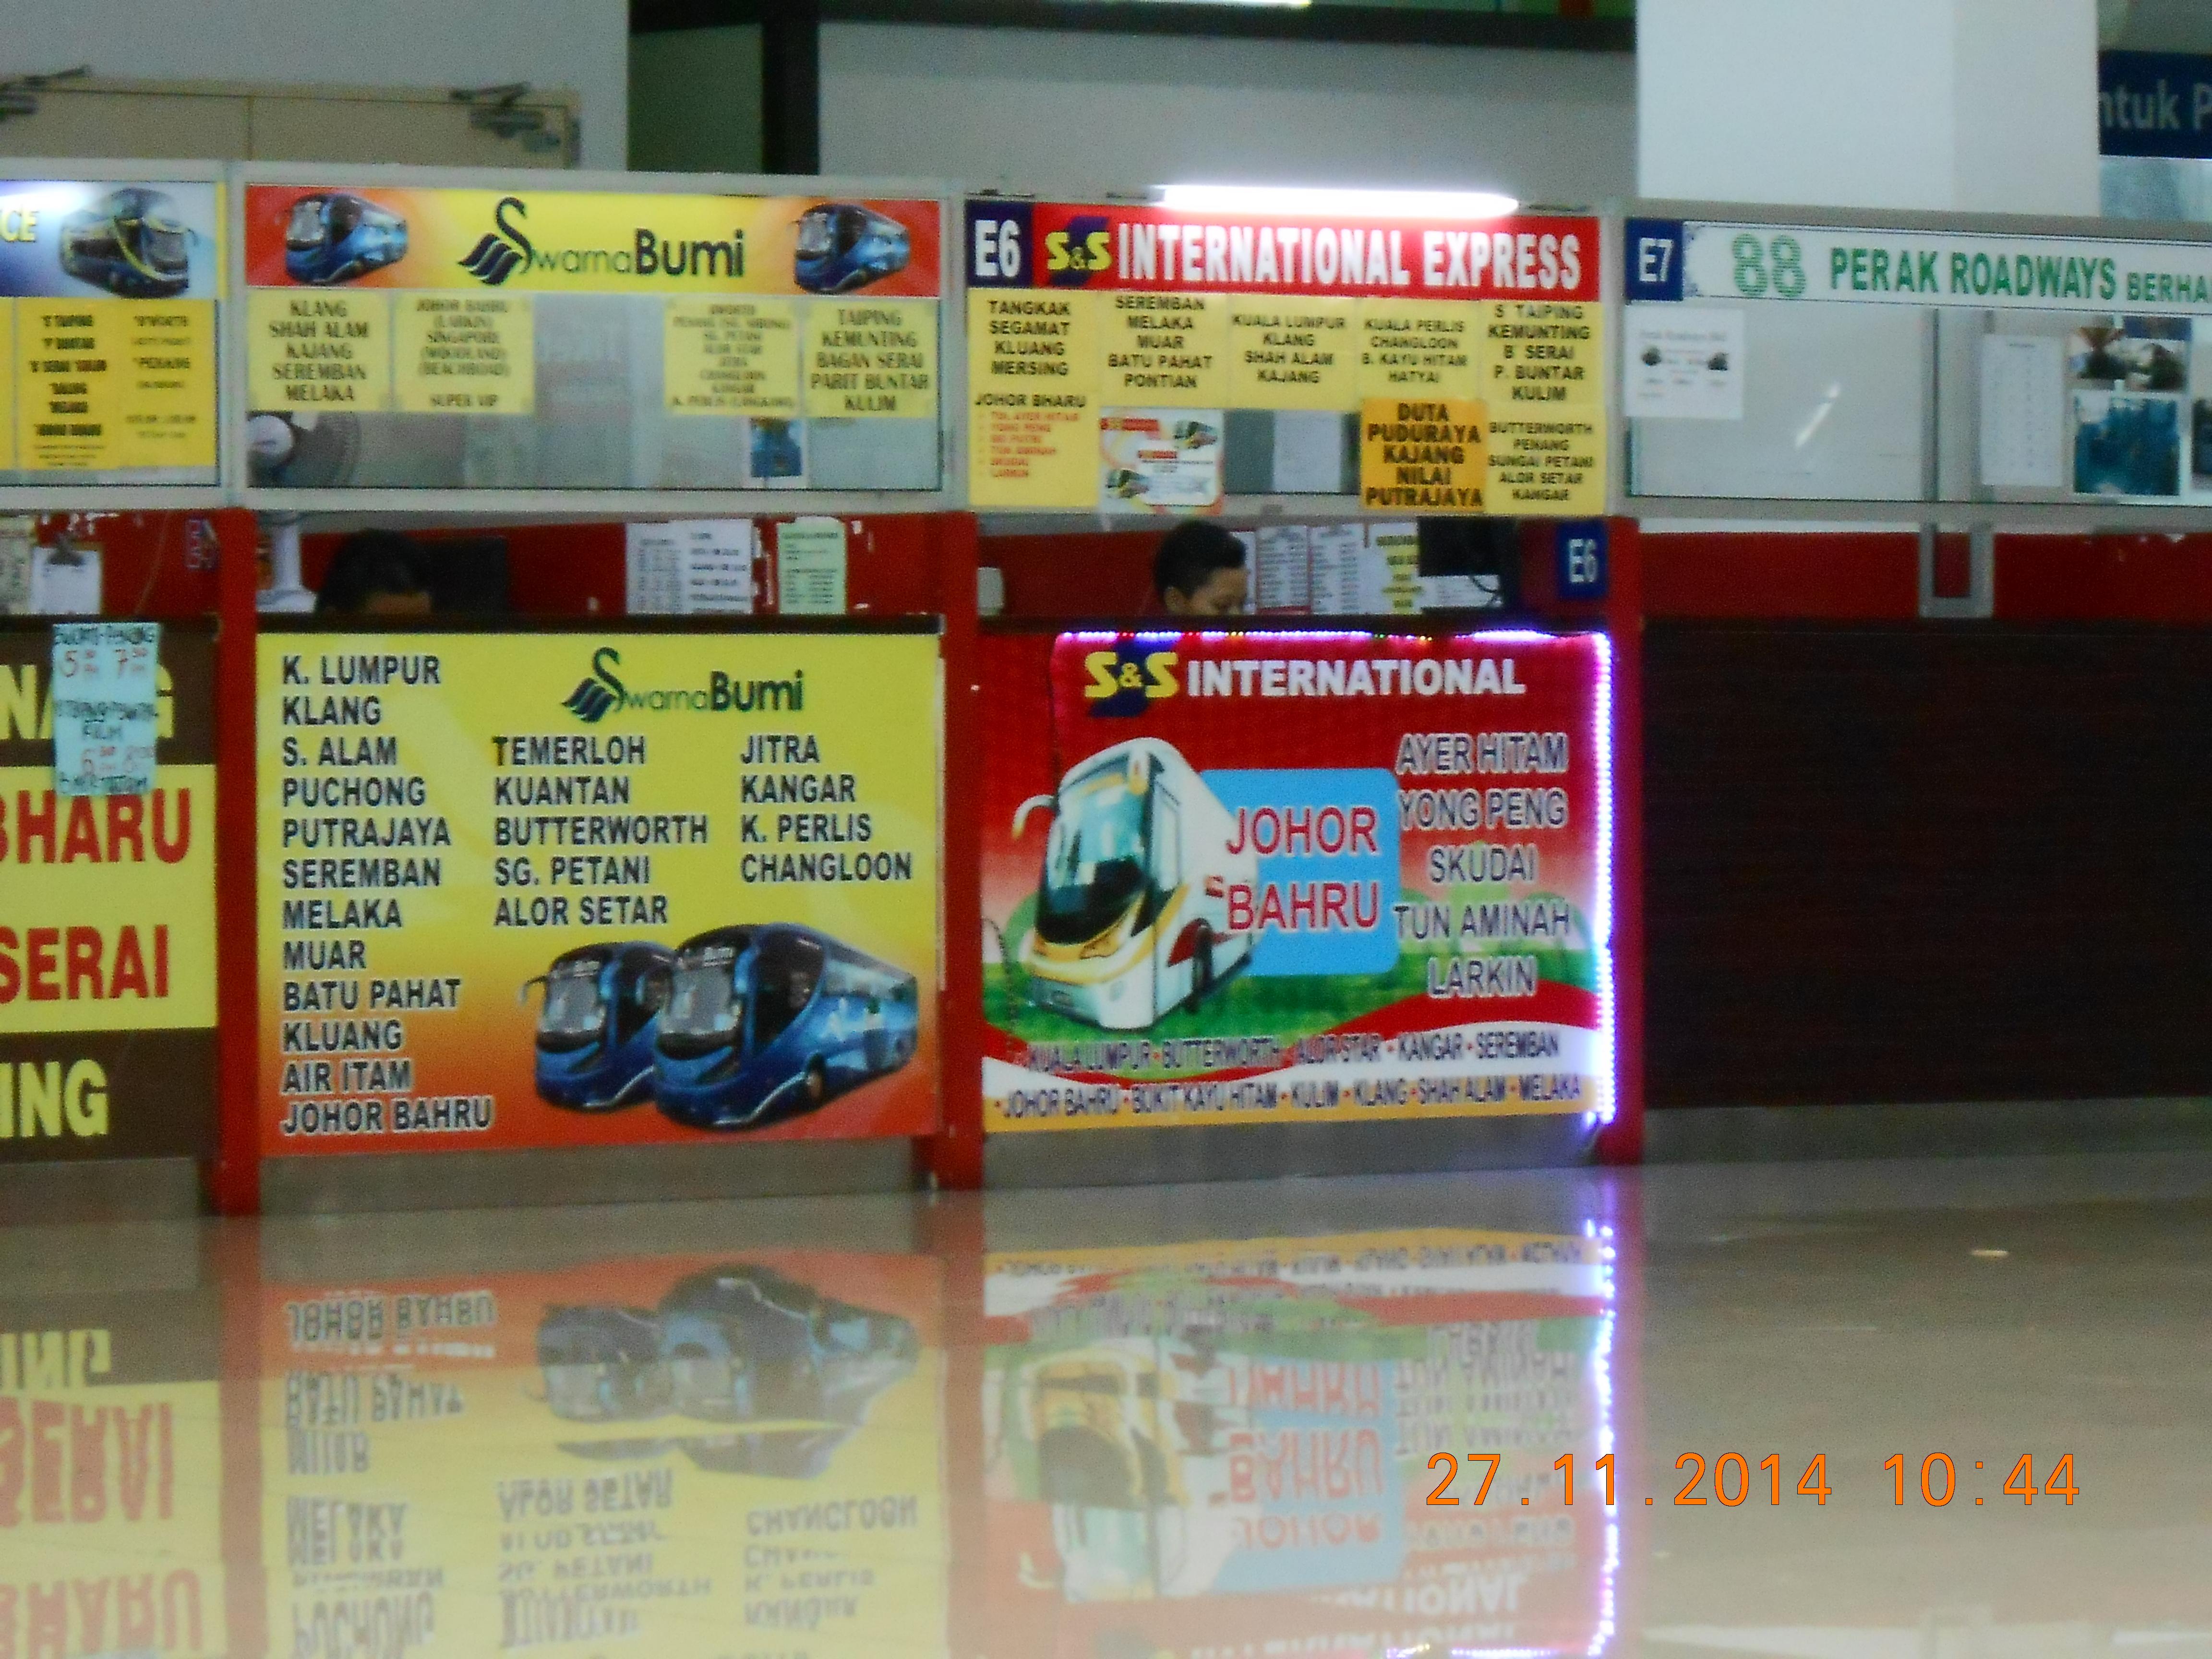 The Amanjaya Bus Terminal Ipoh 1 Weehingthong